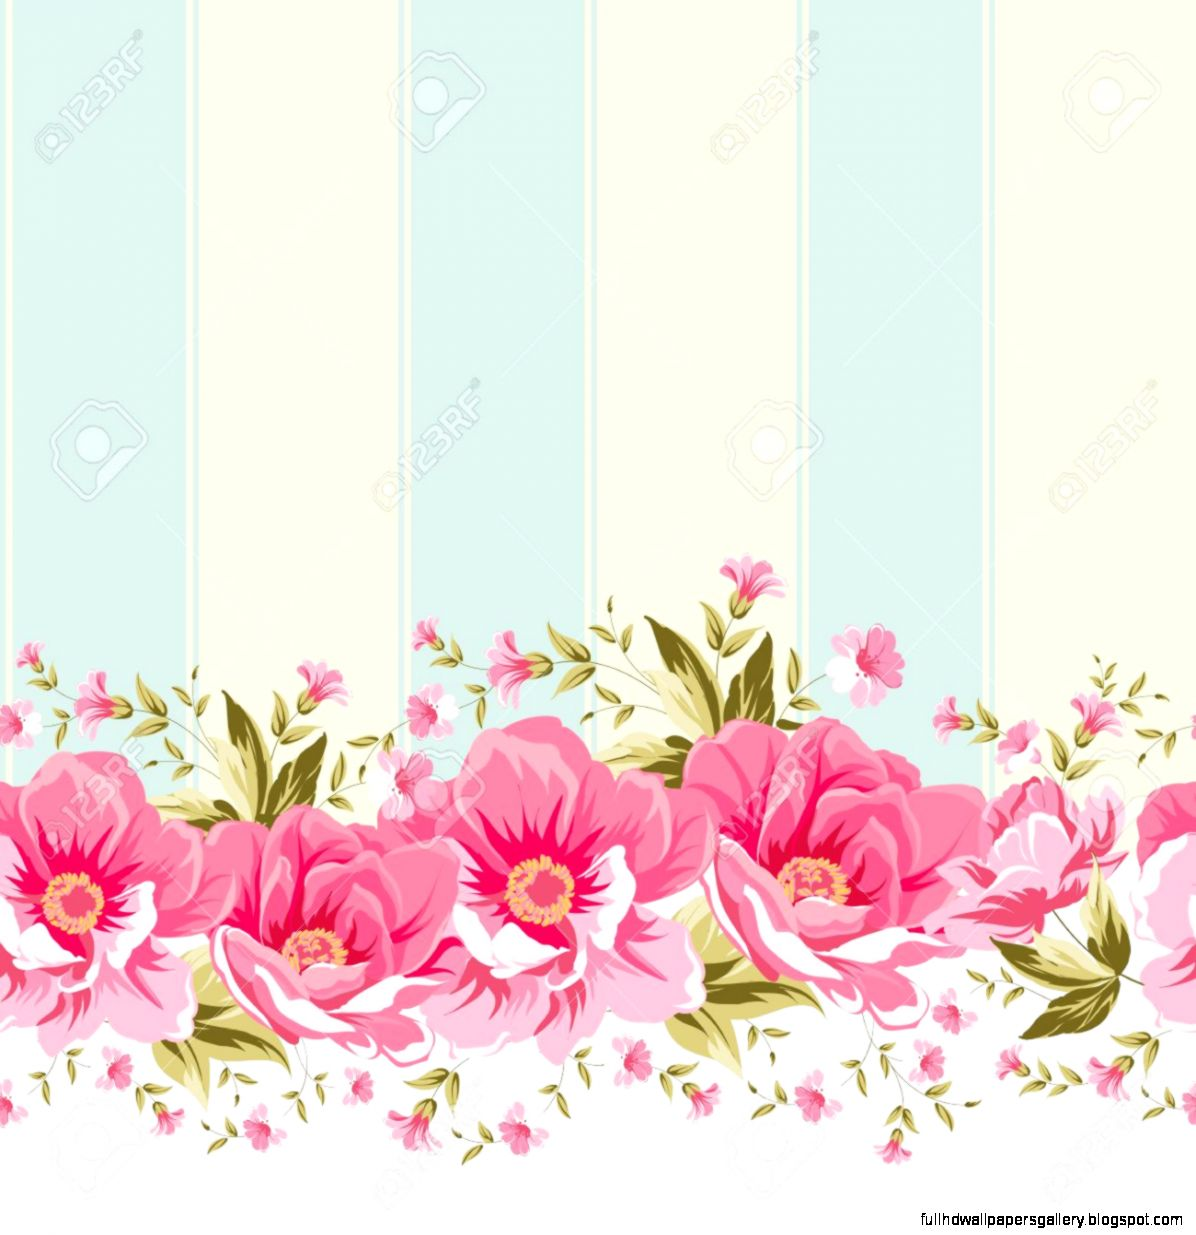 Pink Flower Wallpaper Border Full Hd Wallpapers